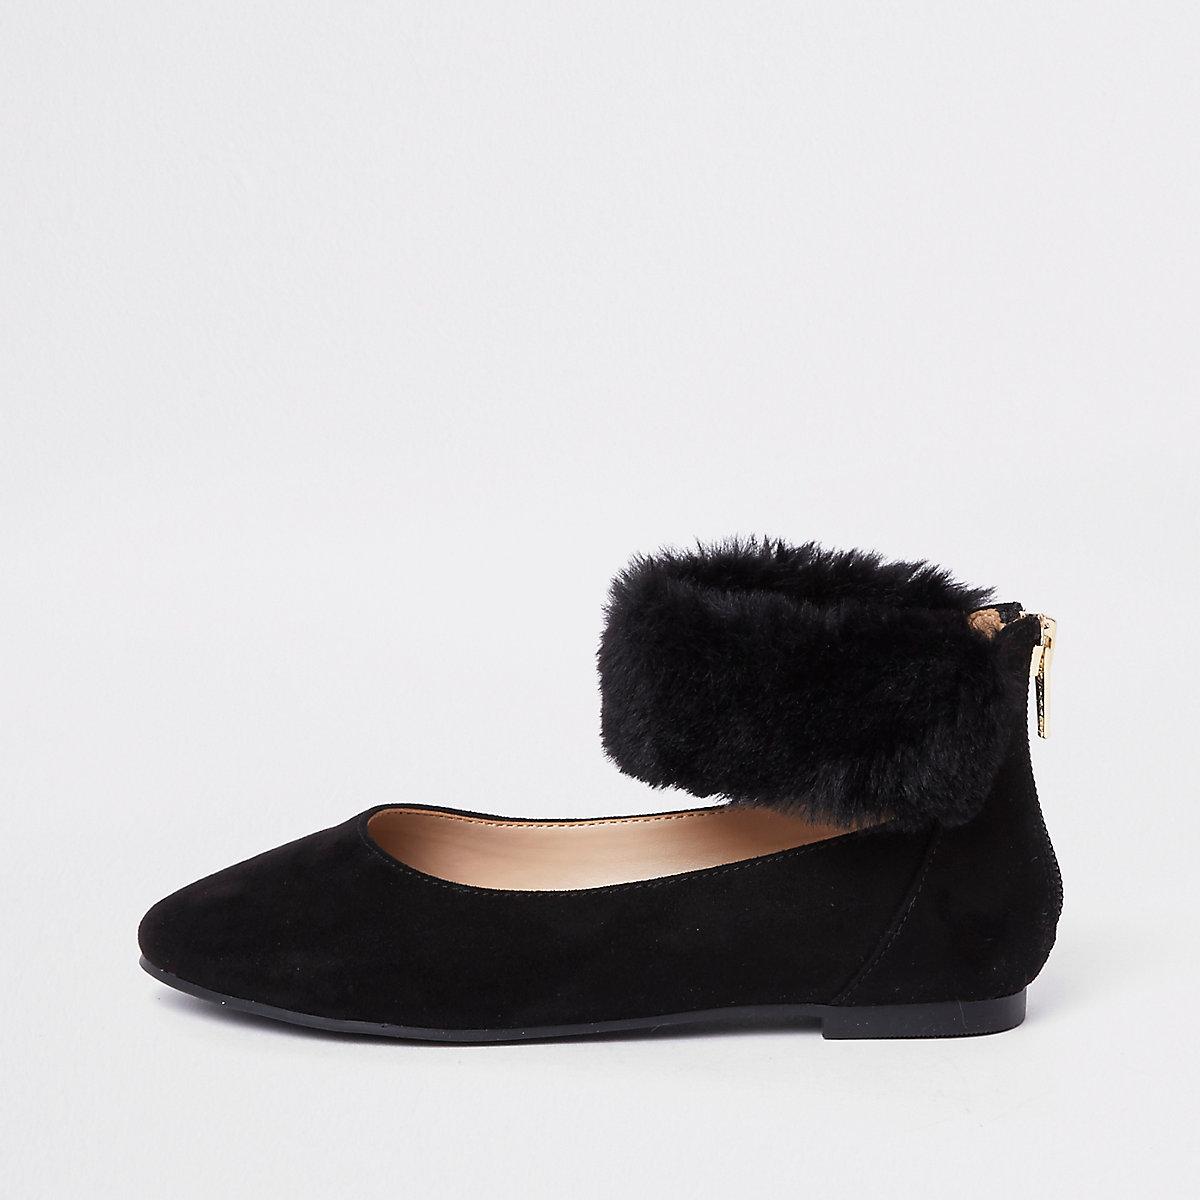 Girls black faux fur ballerina pumps